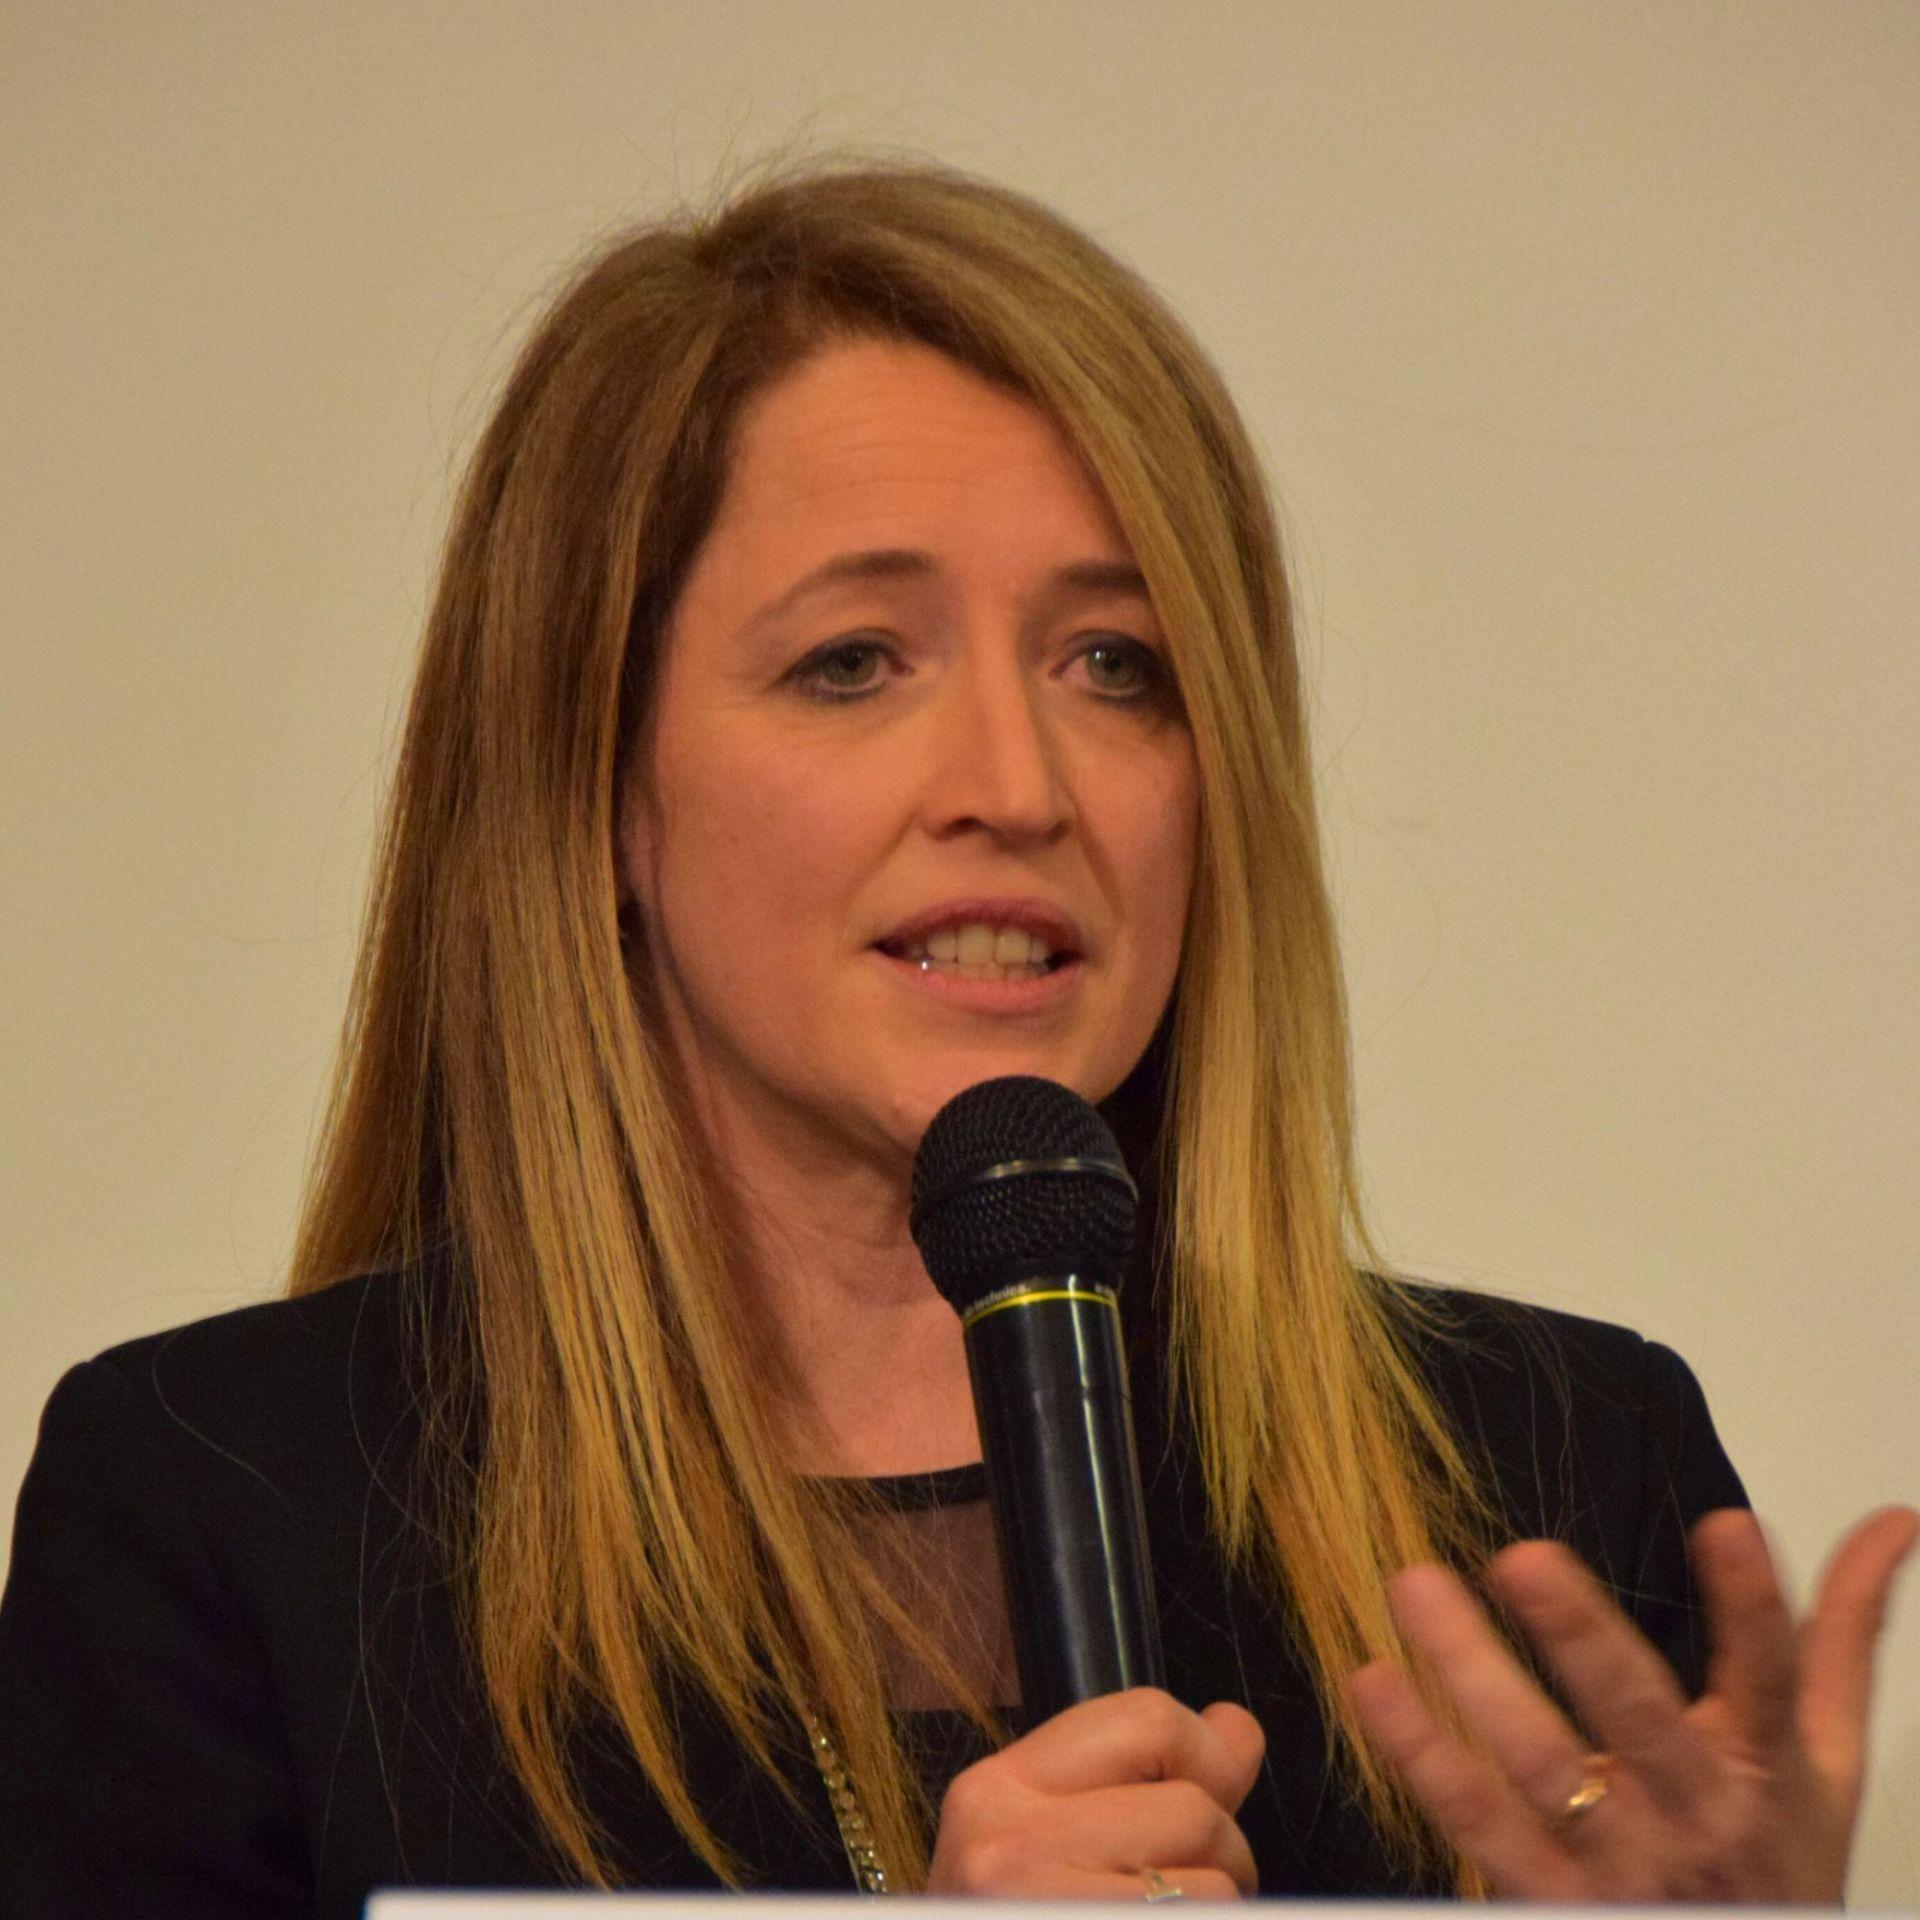 Paola Signori